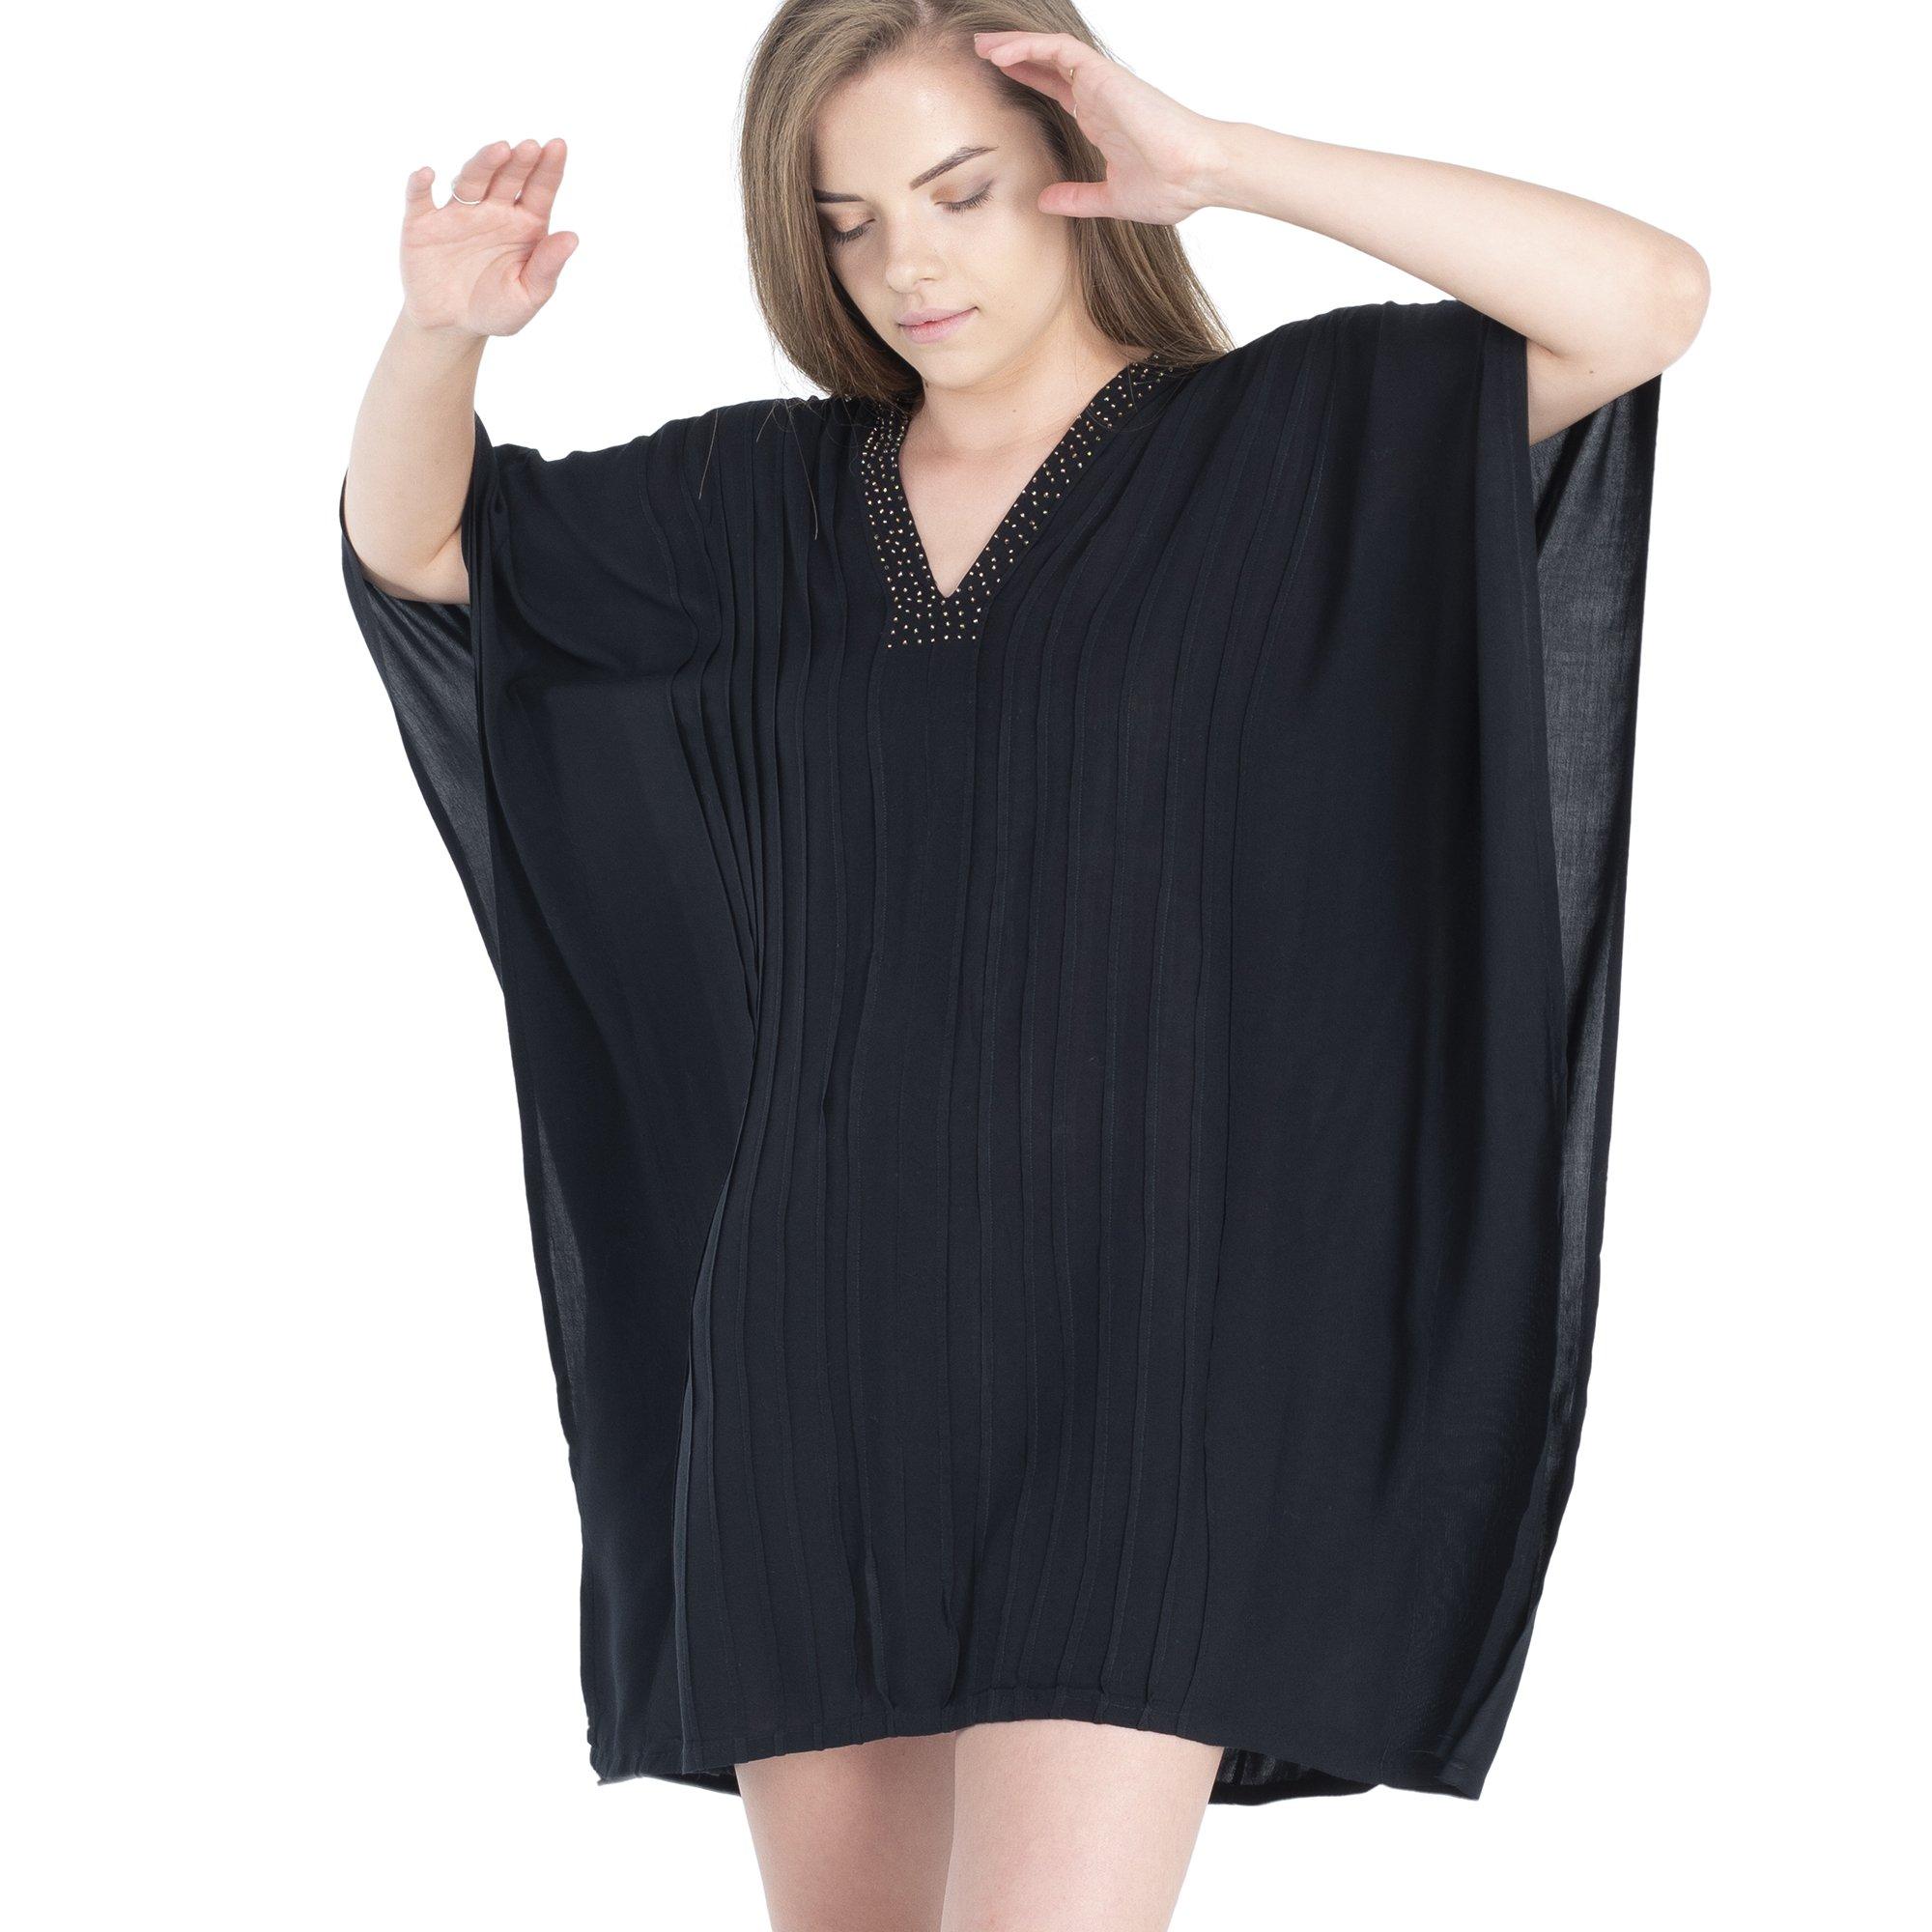 Boho Village Swimsuit Cover Ups for Women - Beach Dress, Black, One Size